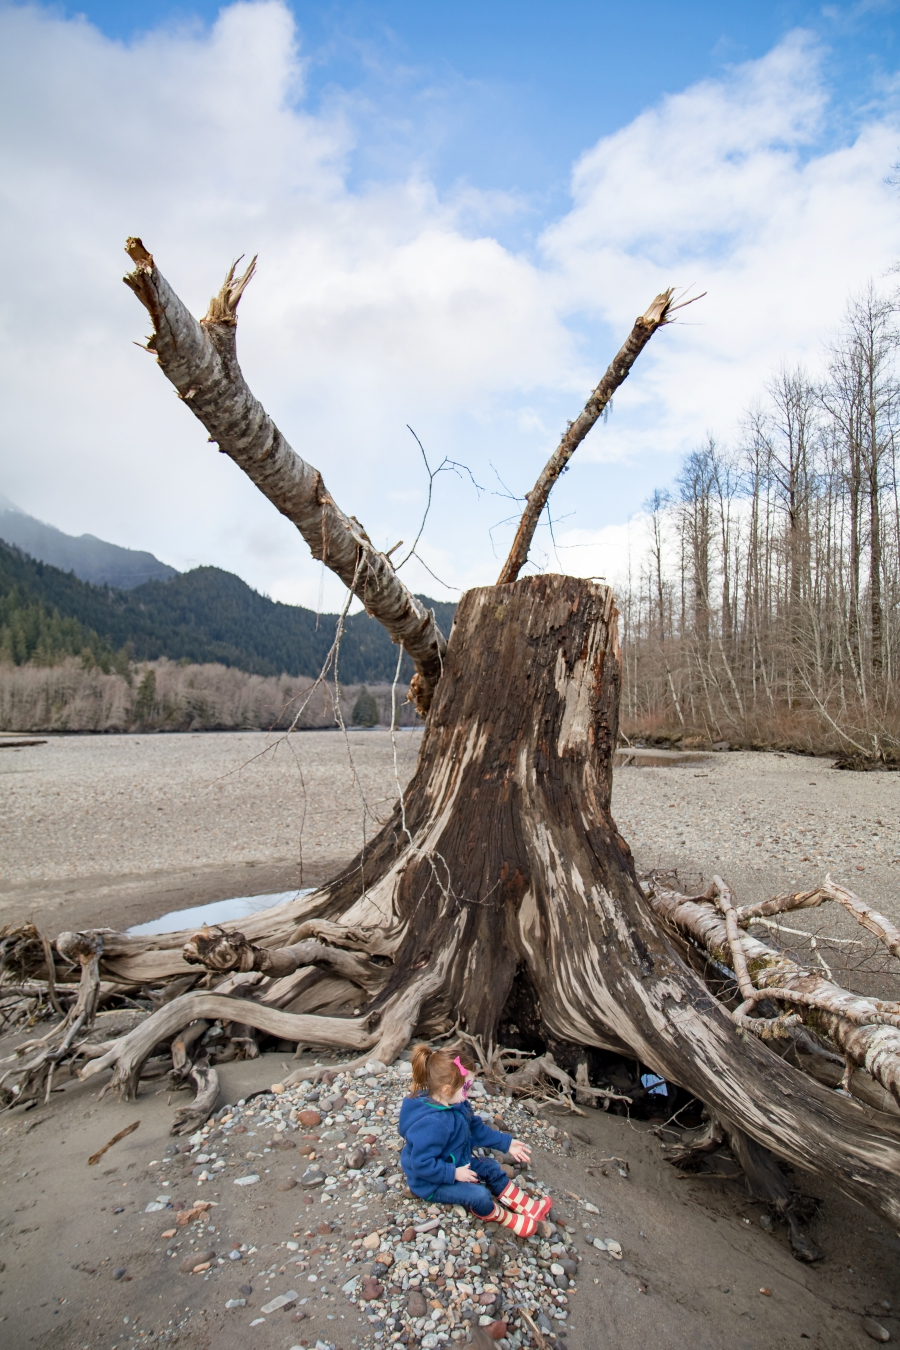 Squamish River Estuary, preschooler sitting beside a large stump